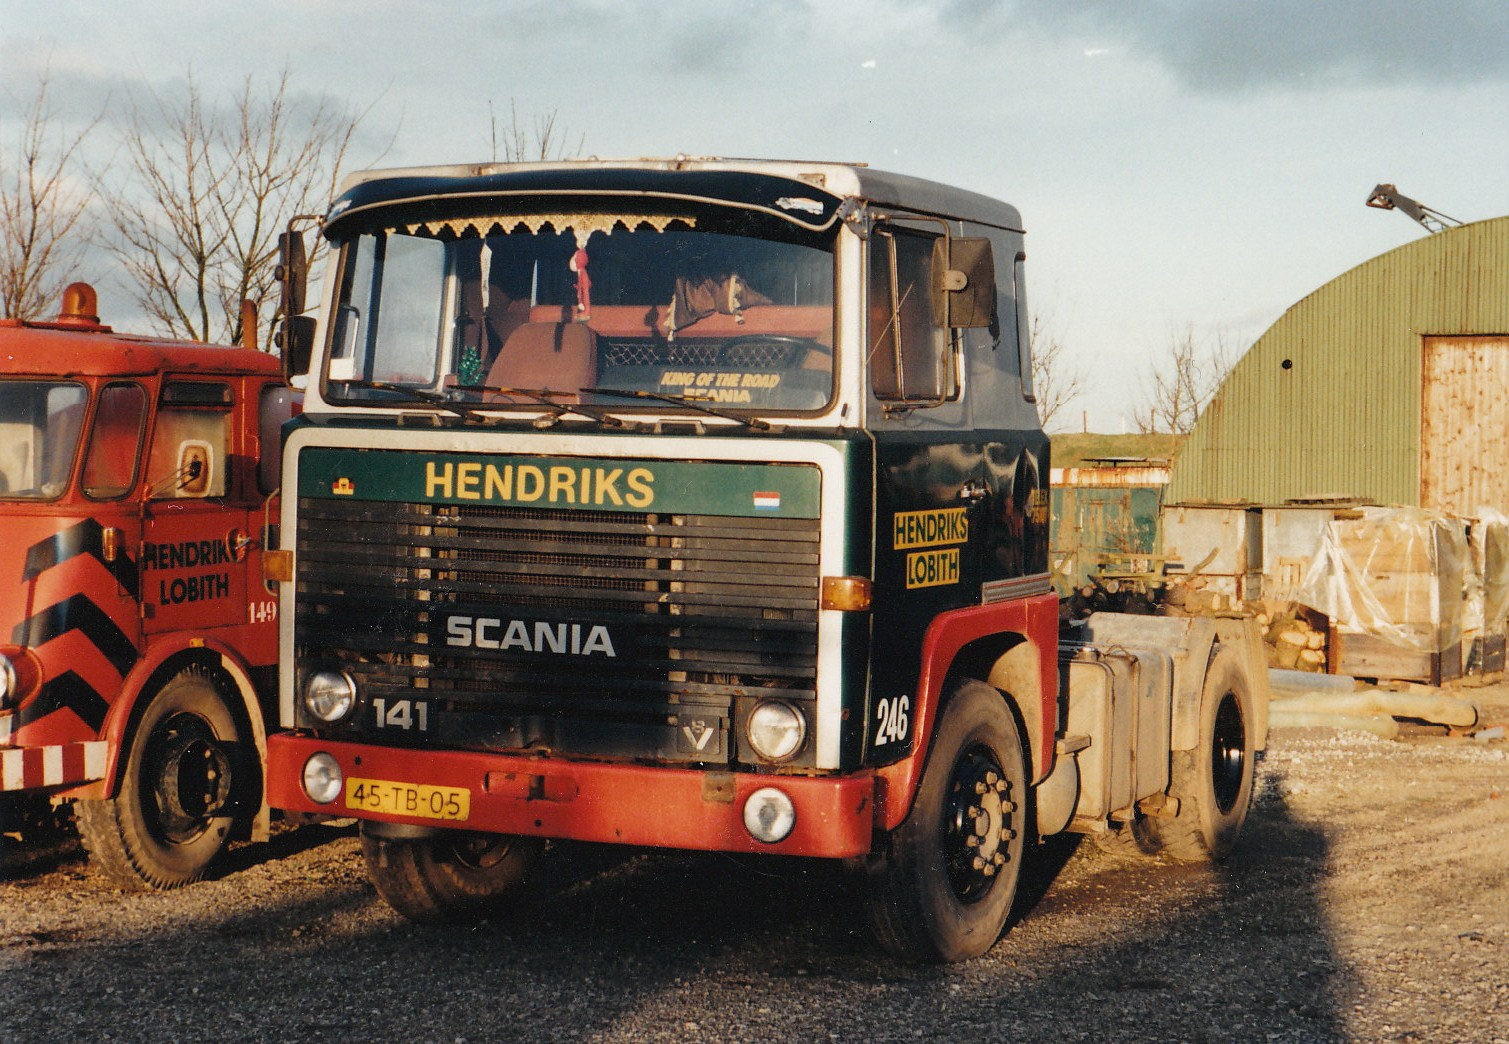 Hendriks-Lobith-Scania-LB141-45TB05